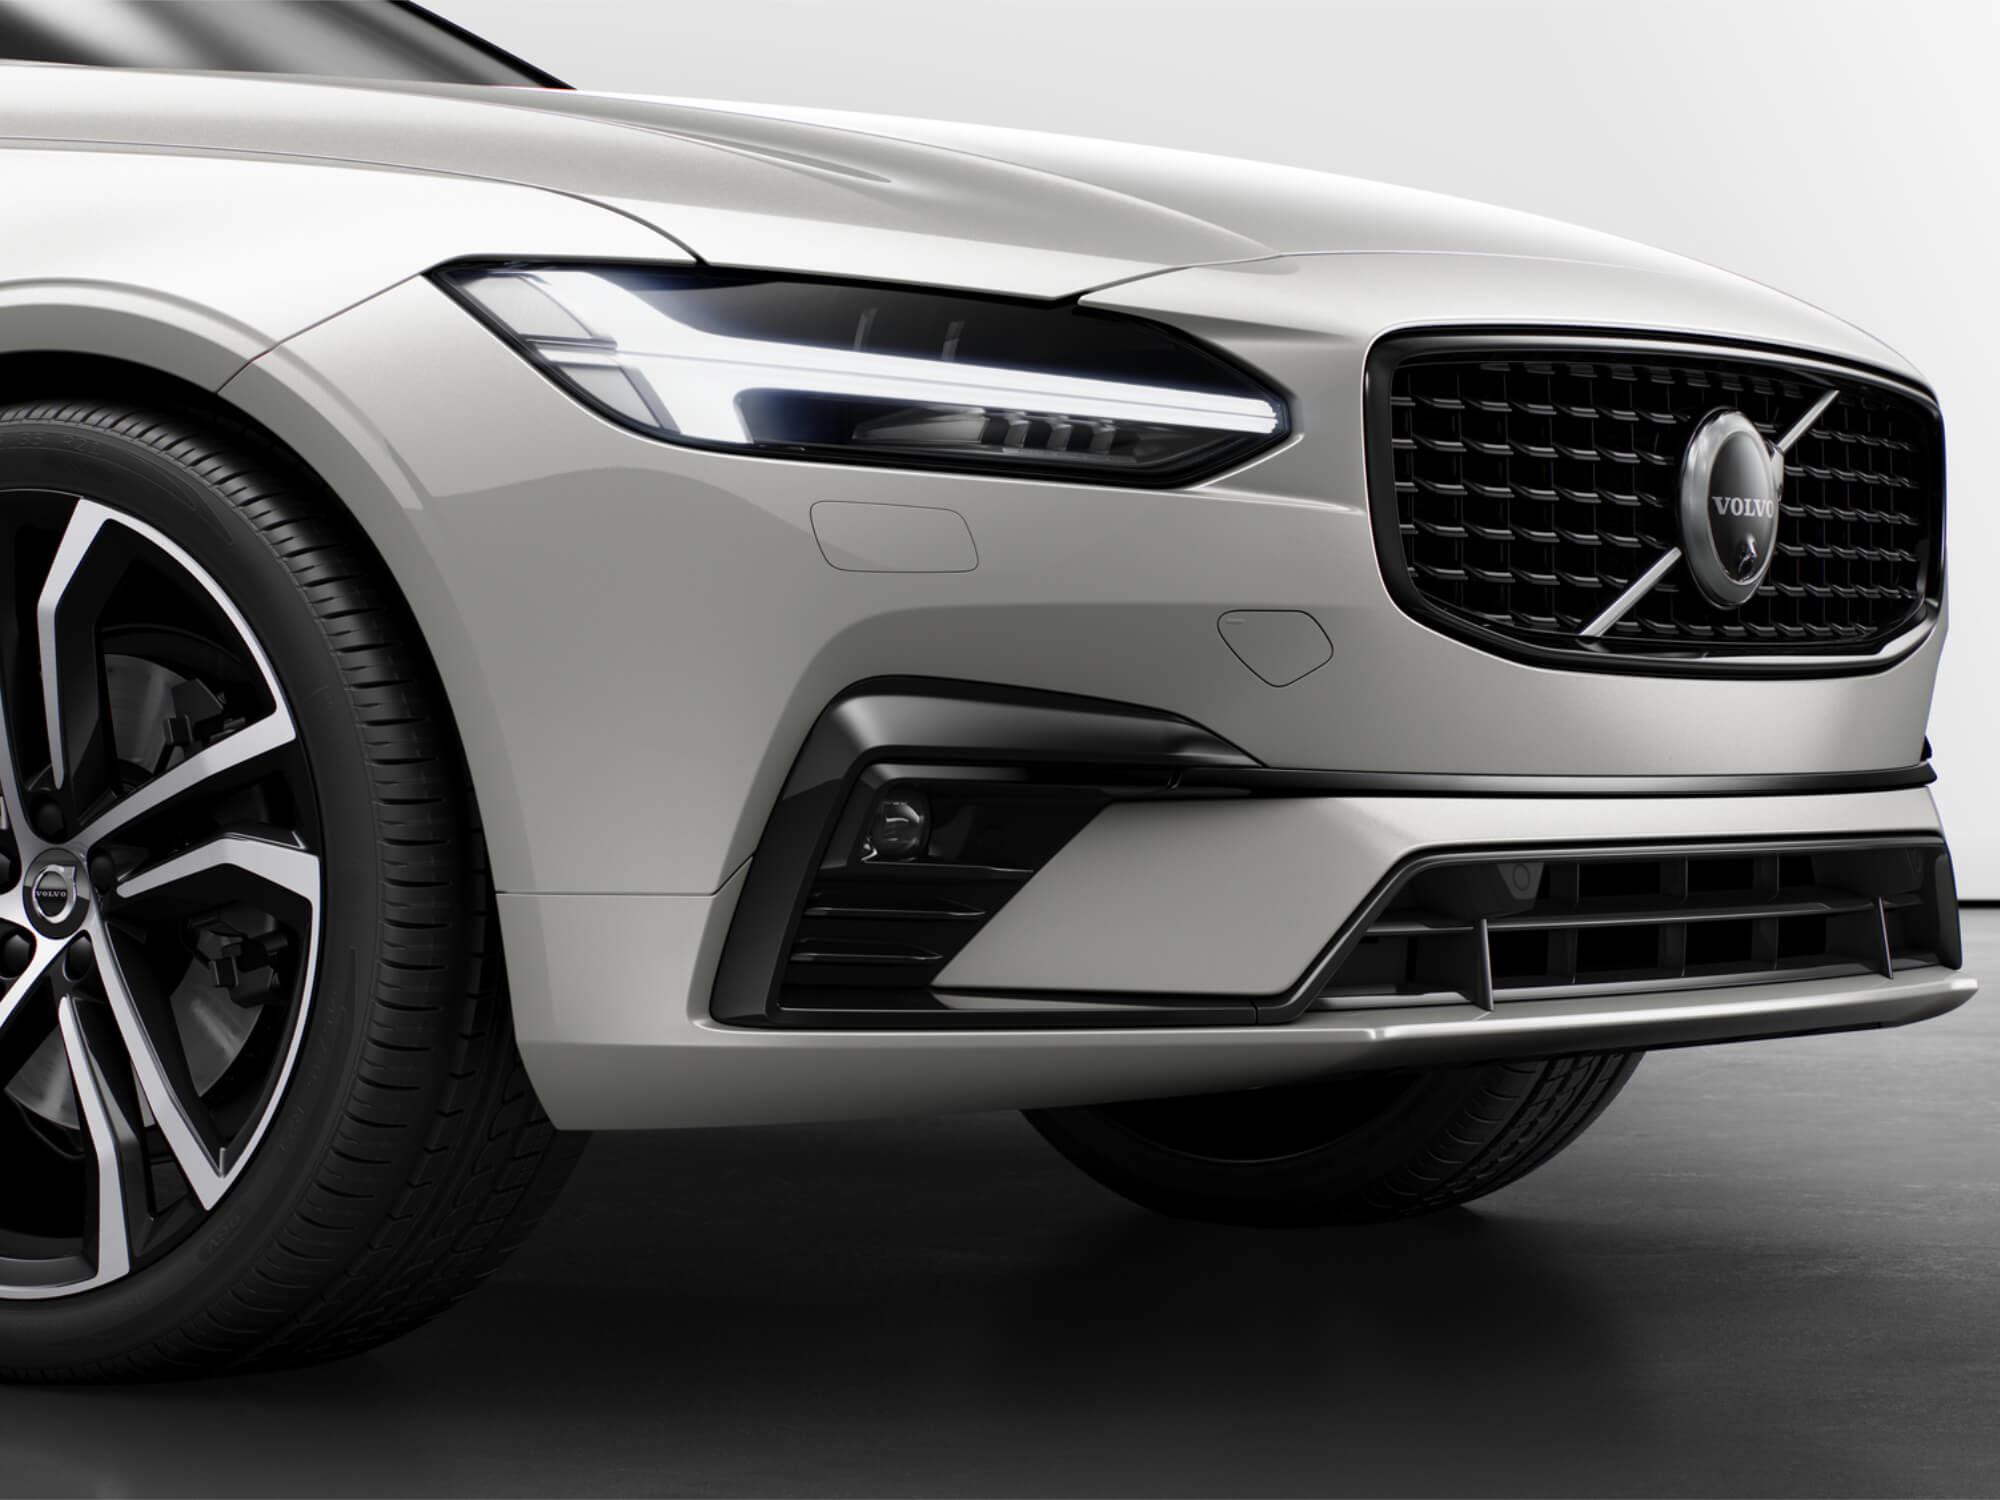 Volvo V90 Mild Hybrid voorkant